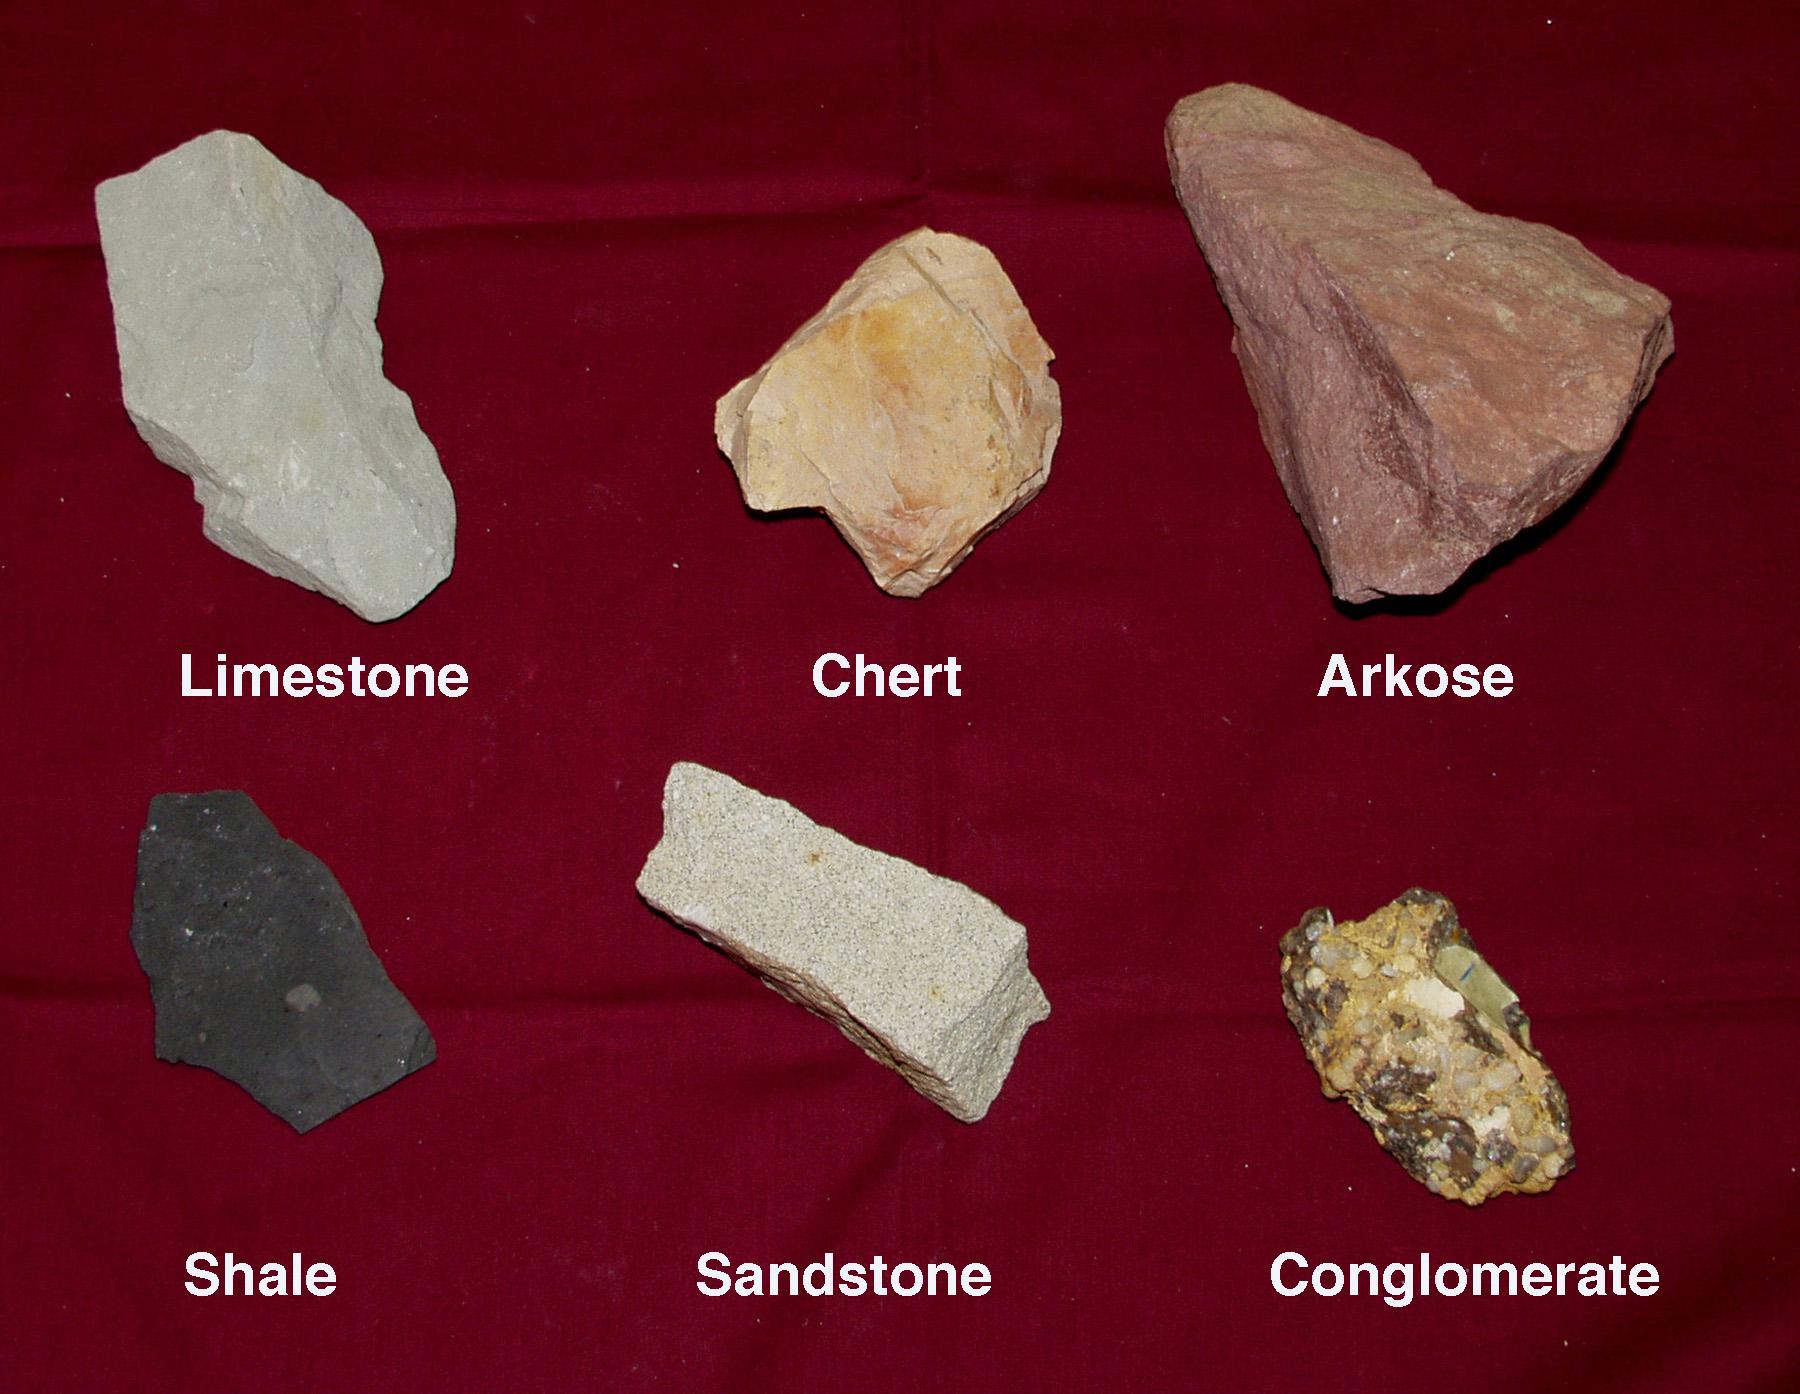 Different Types of Sedimentary Rocks